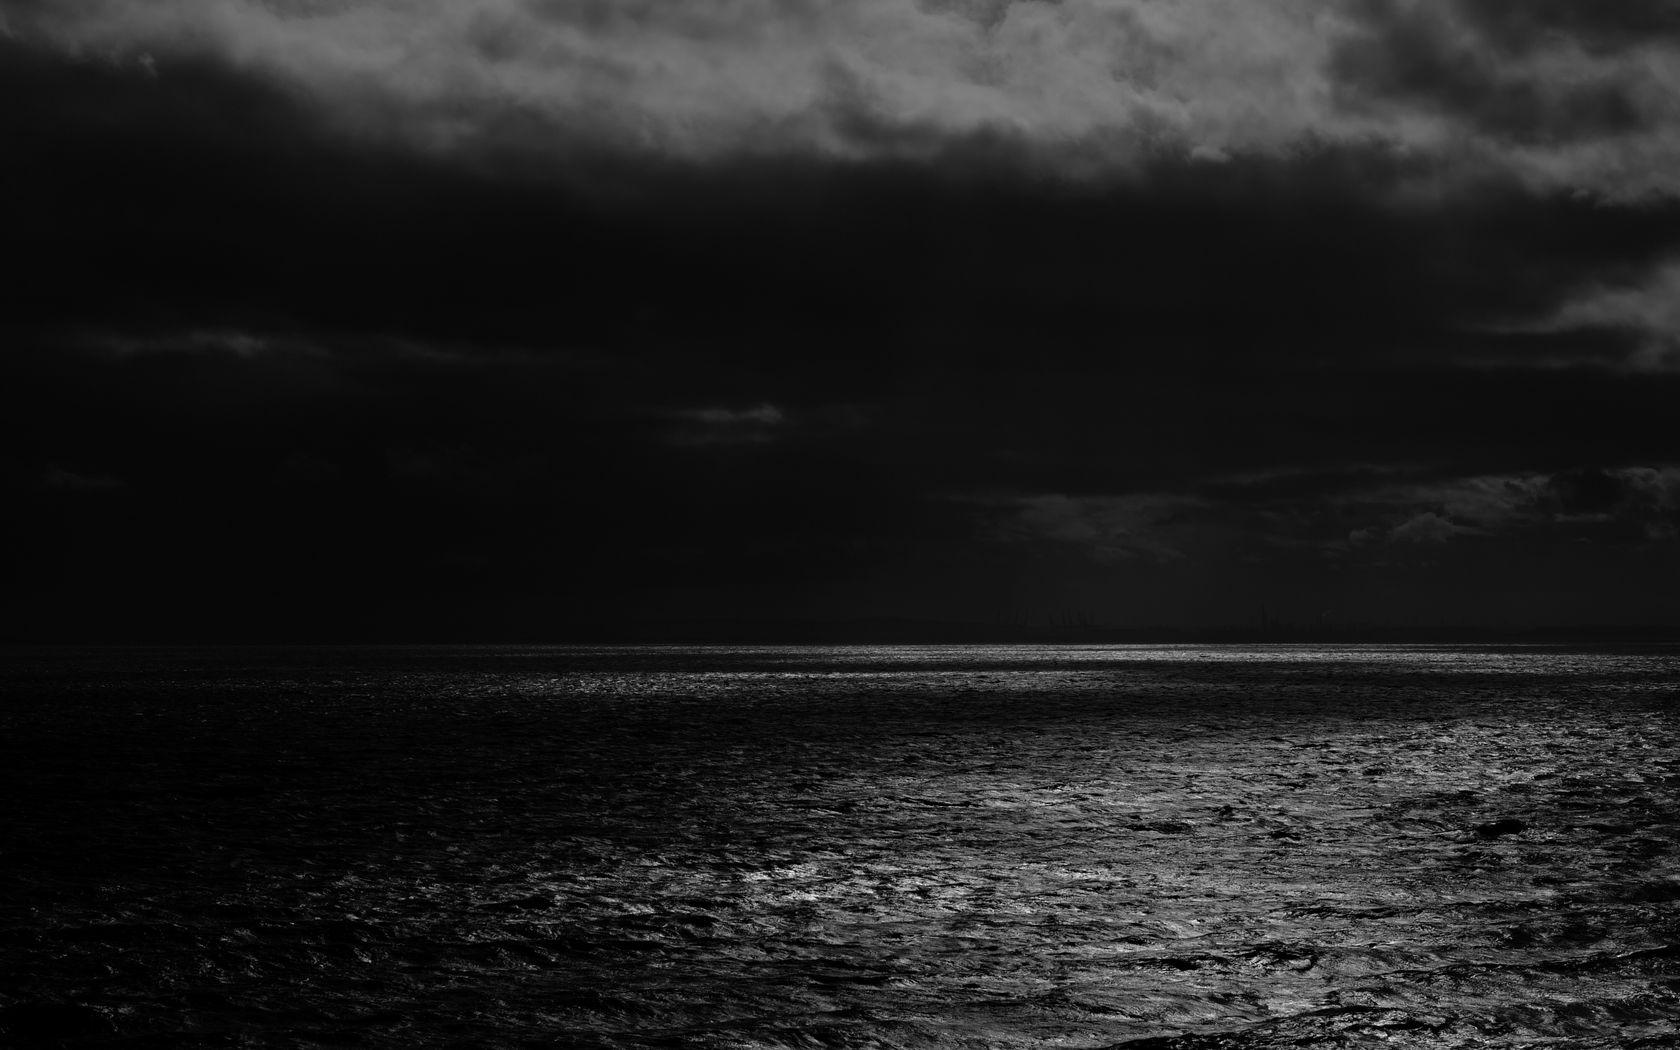 1680x1050 Wallpaper sea, horizon, bw, overcast, clouds, ripples